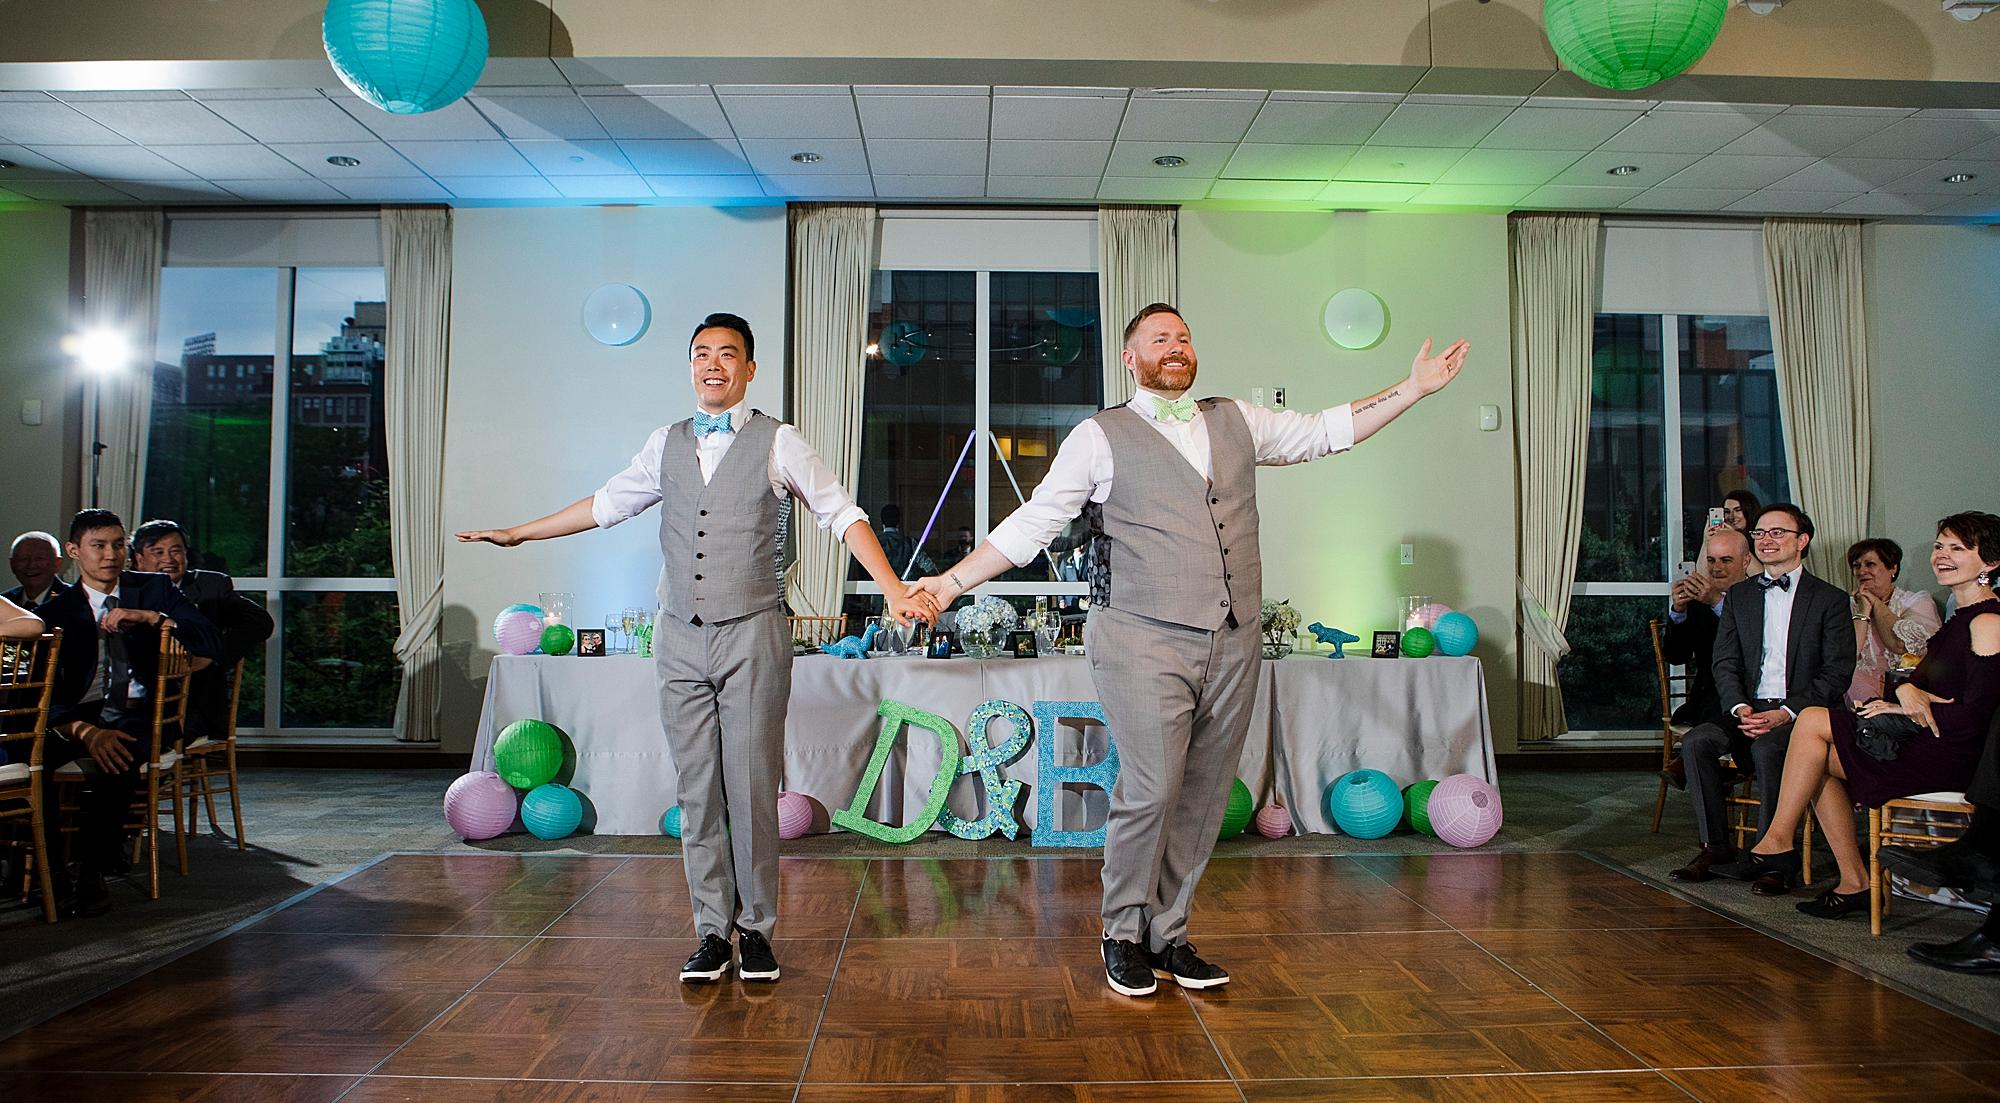 Dan_and_Byron_Love_by_Joe_Mac_Philadelphia_Wedding_LGBTQ_Photography_Gay_Independence_visitor_Center_125.JPG